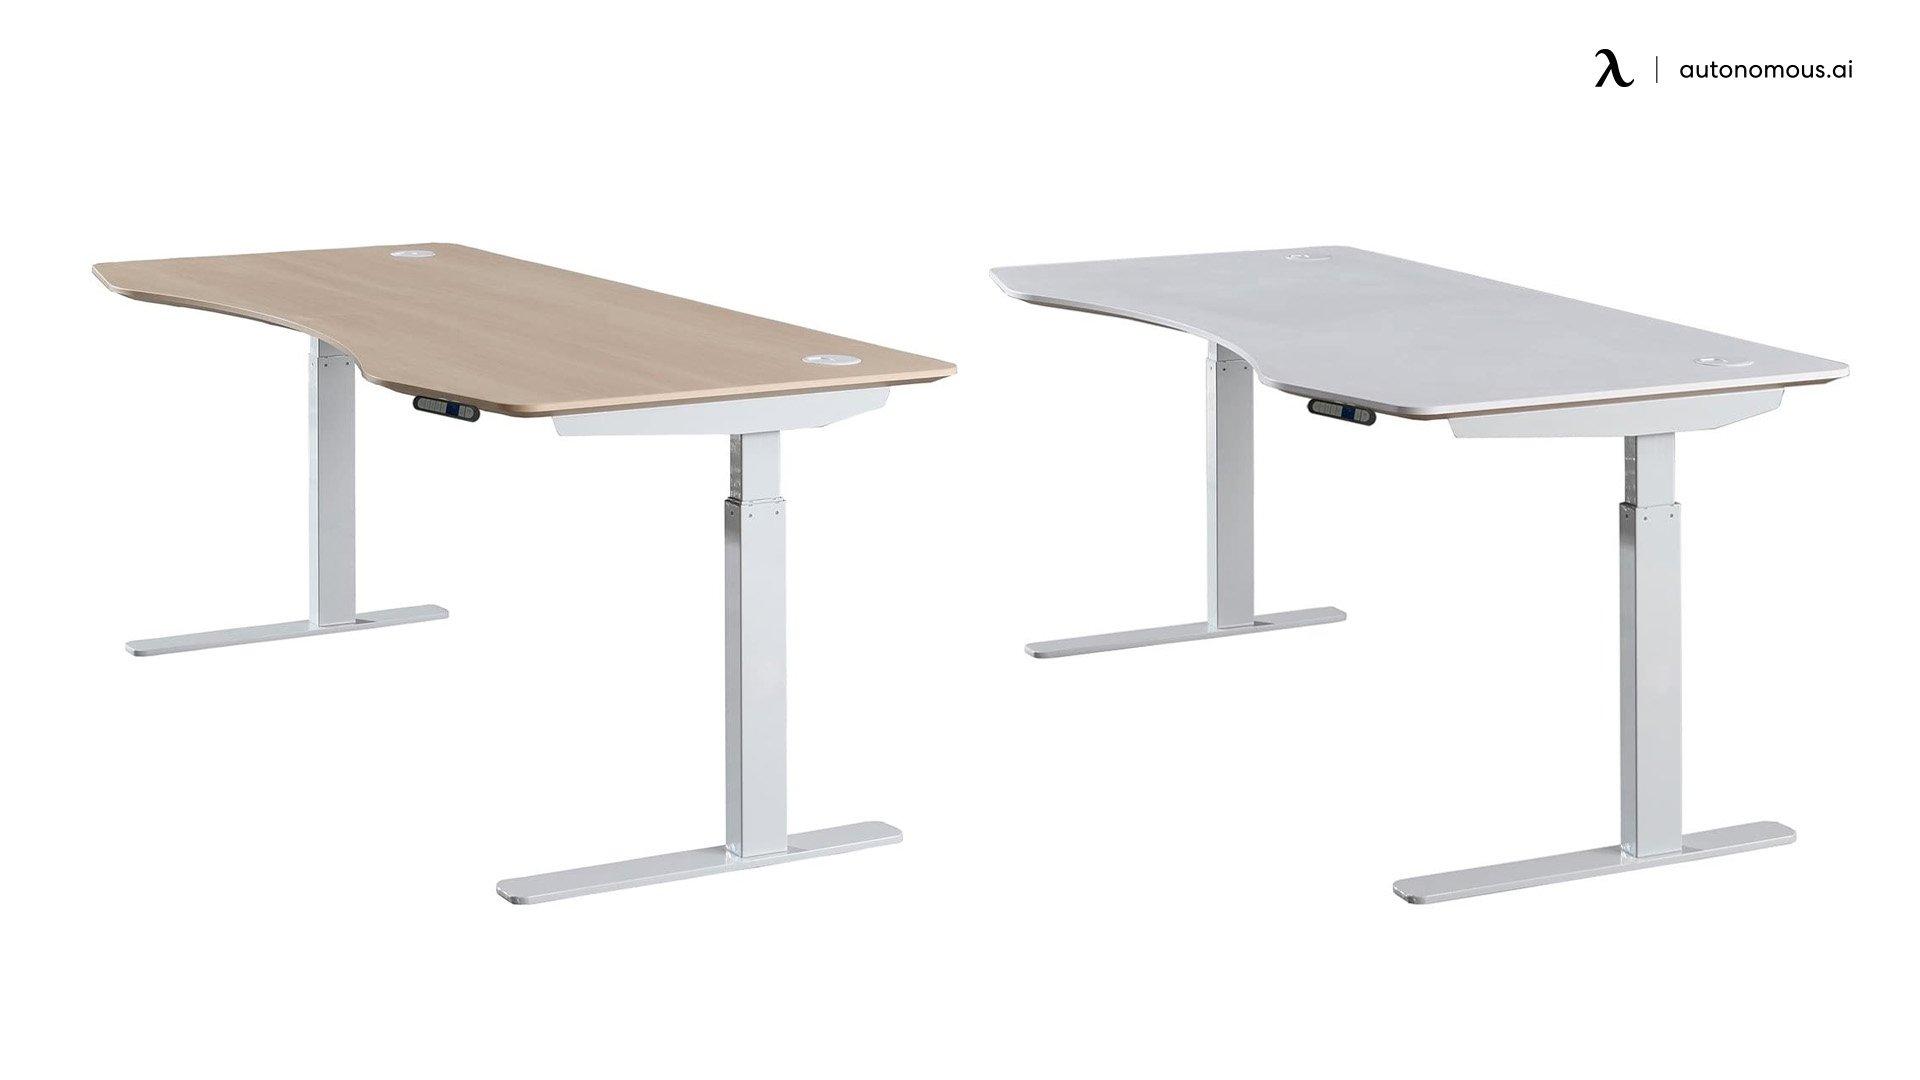 ApexDesk Elite Electric Standing Desk